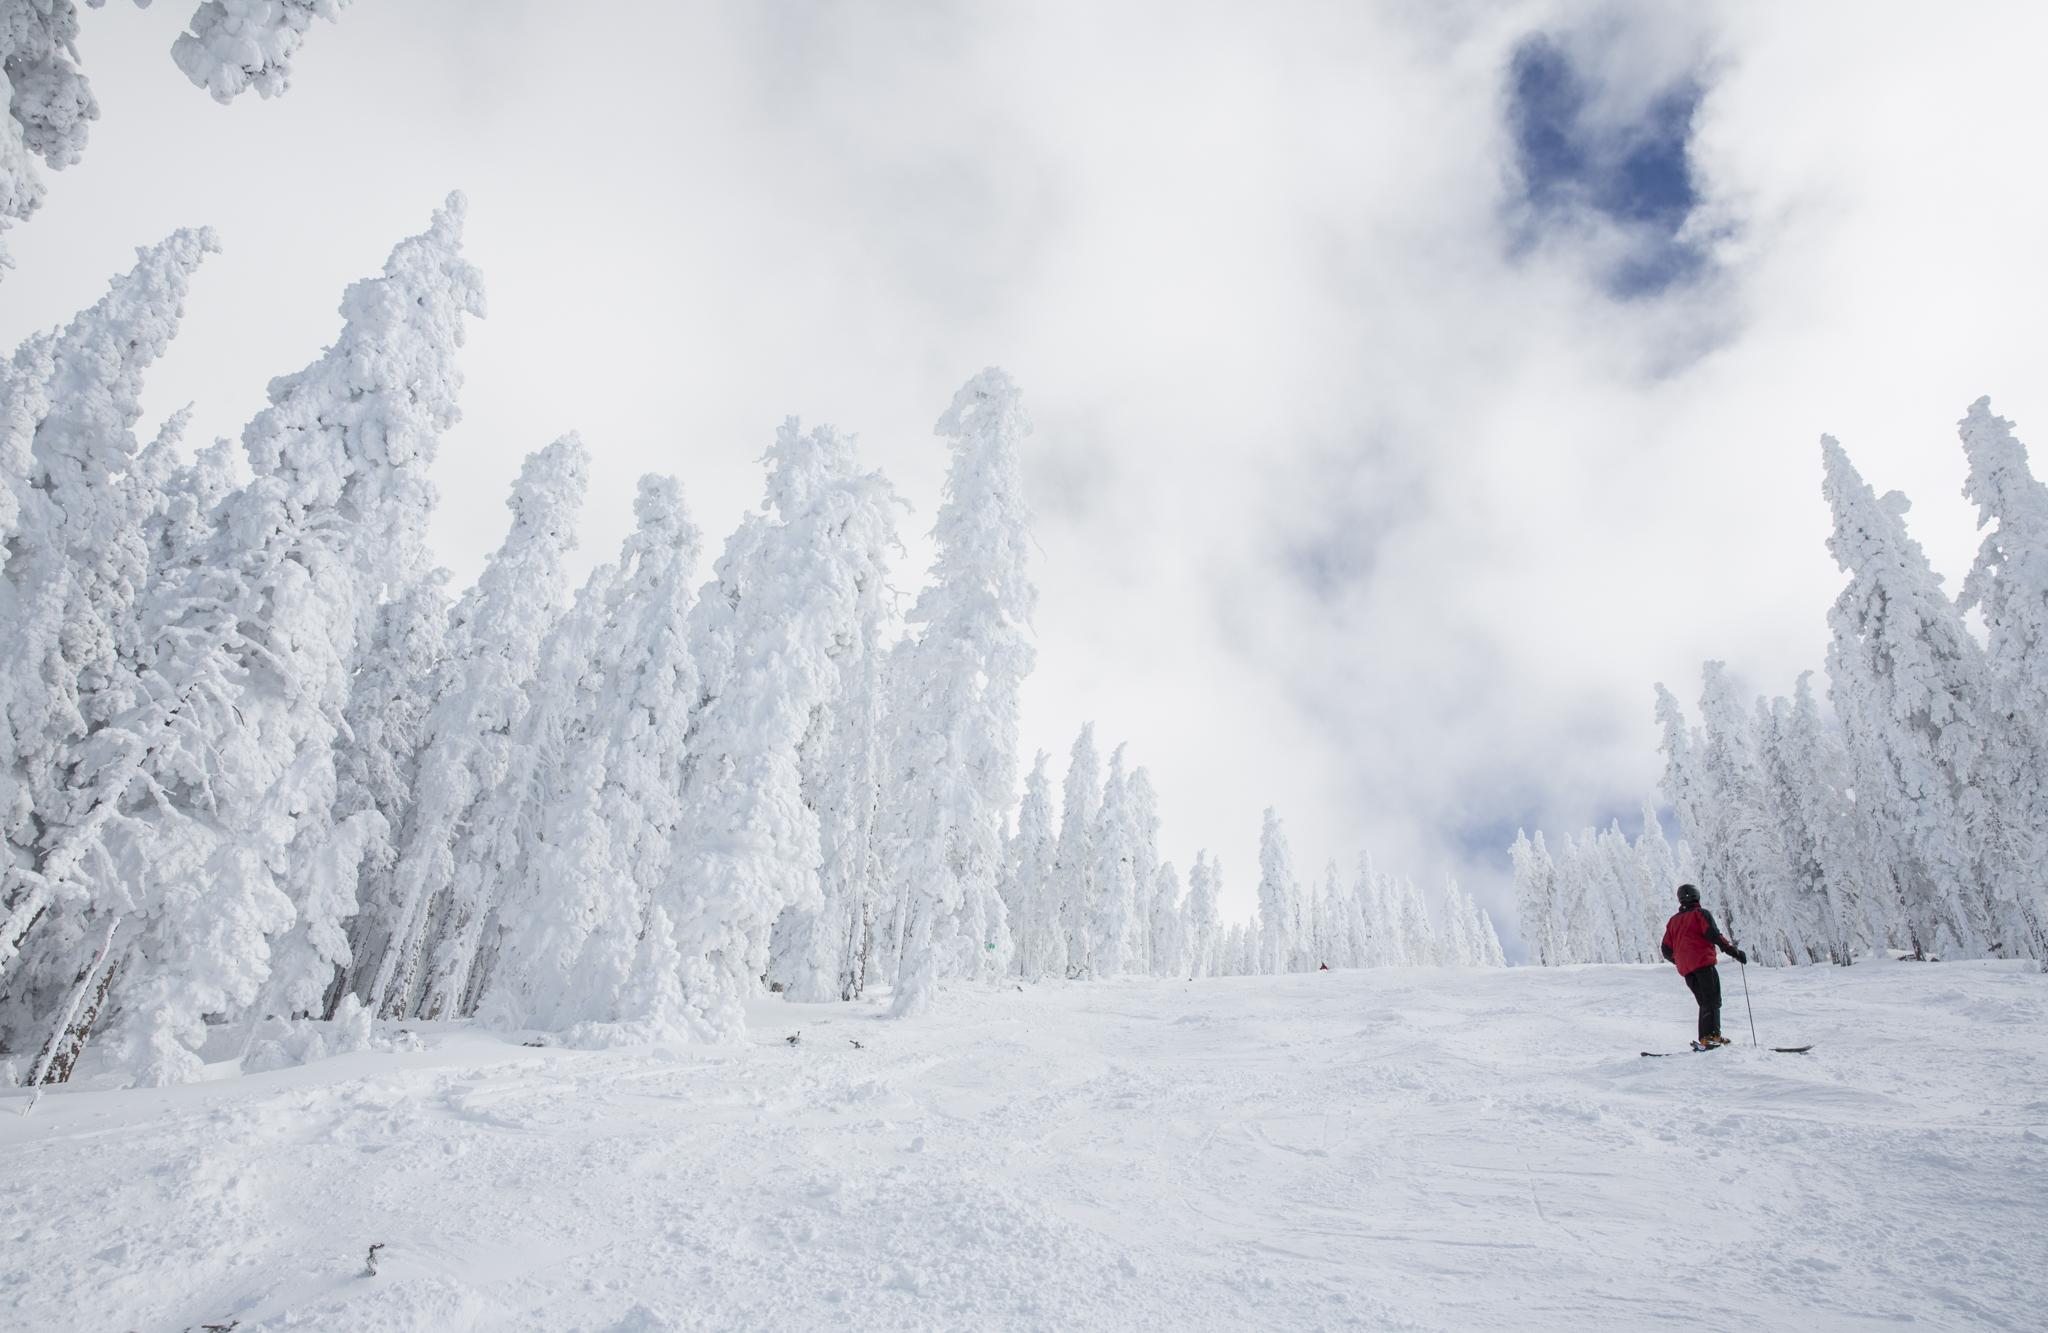 Ski Santa Fe on flagstaff ski map, red river ski area map, aspen ski map, taos ski map, new mexico ski map, pamporovo piste map, red river nm map, jackson hole ski map, mont tremblant ski map, colorado ski map,